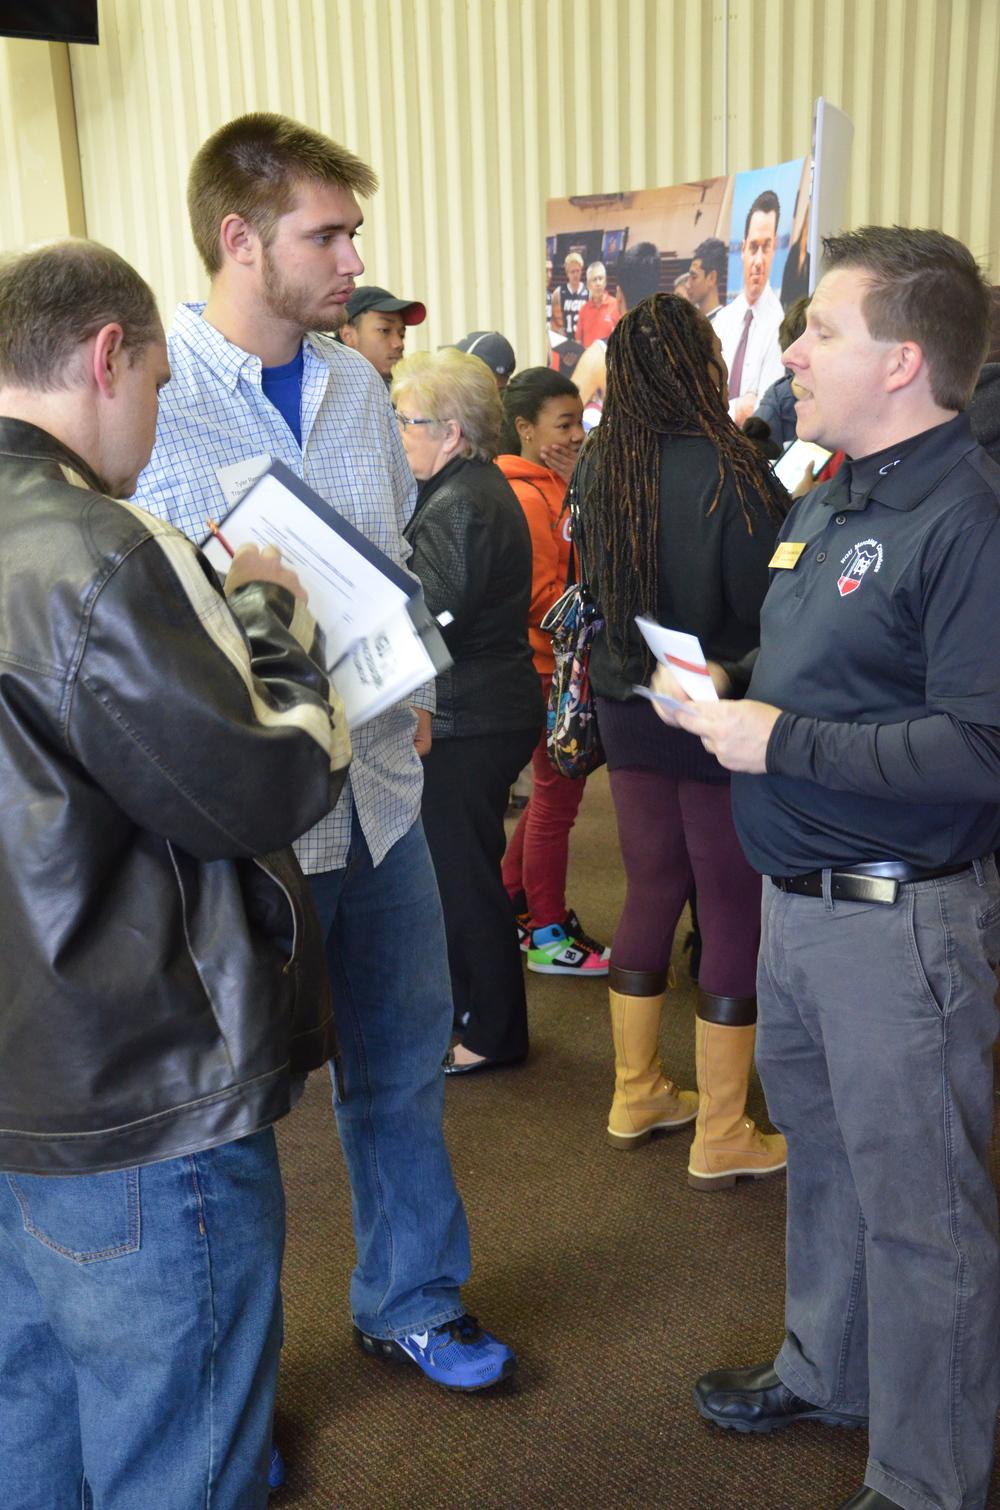 Christopher Davis, a fine arts teacher, talks to a potential student about the Fine Arts Department.